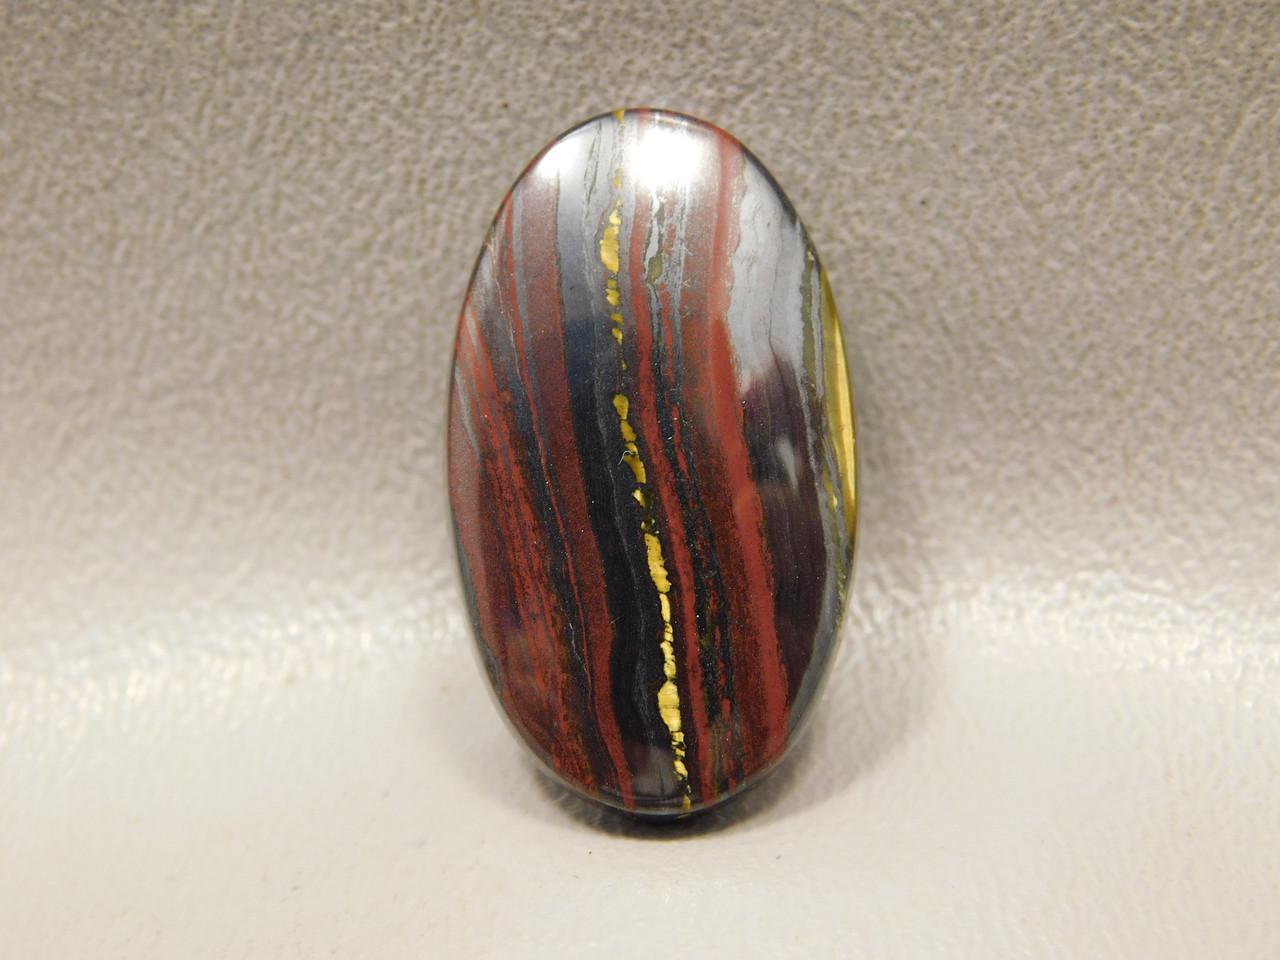 Tiger Iron Semi Precious Gemstone Cabochon #17